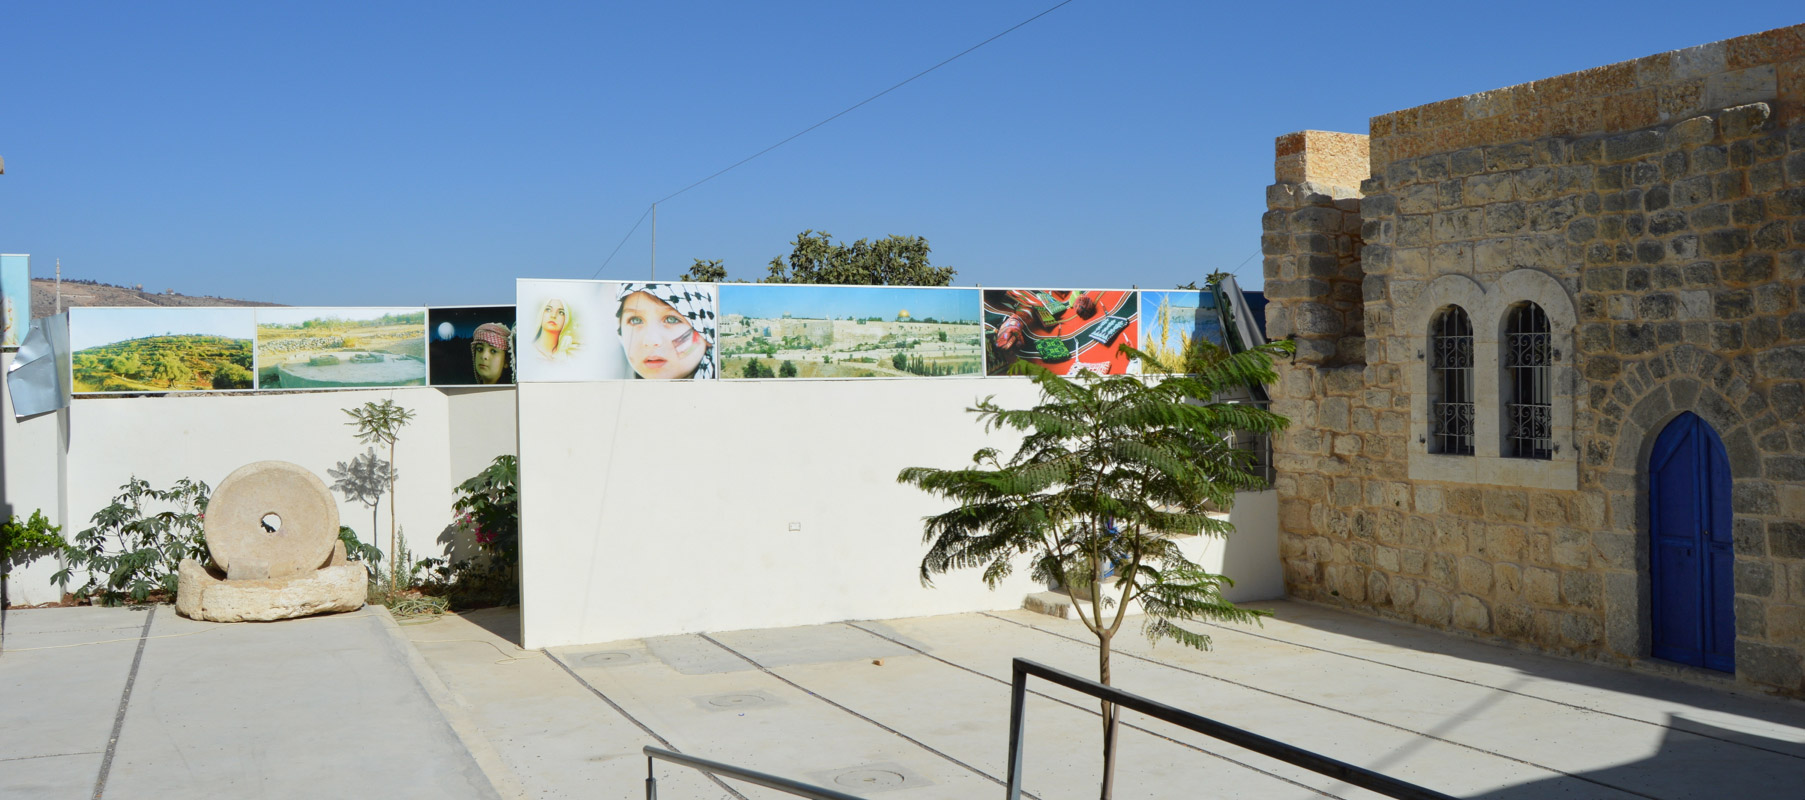 Yabrud , Palestine